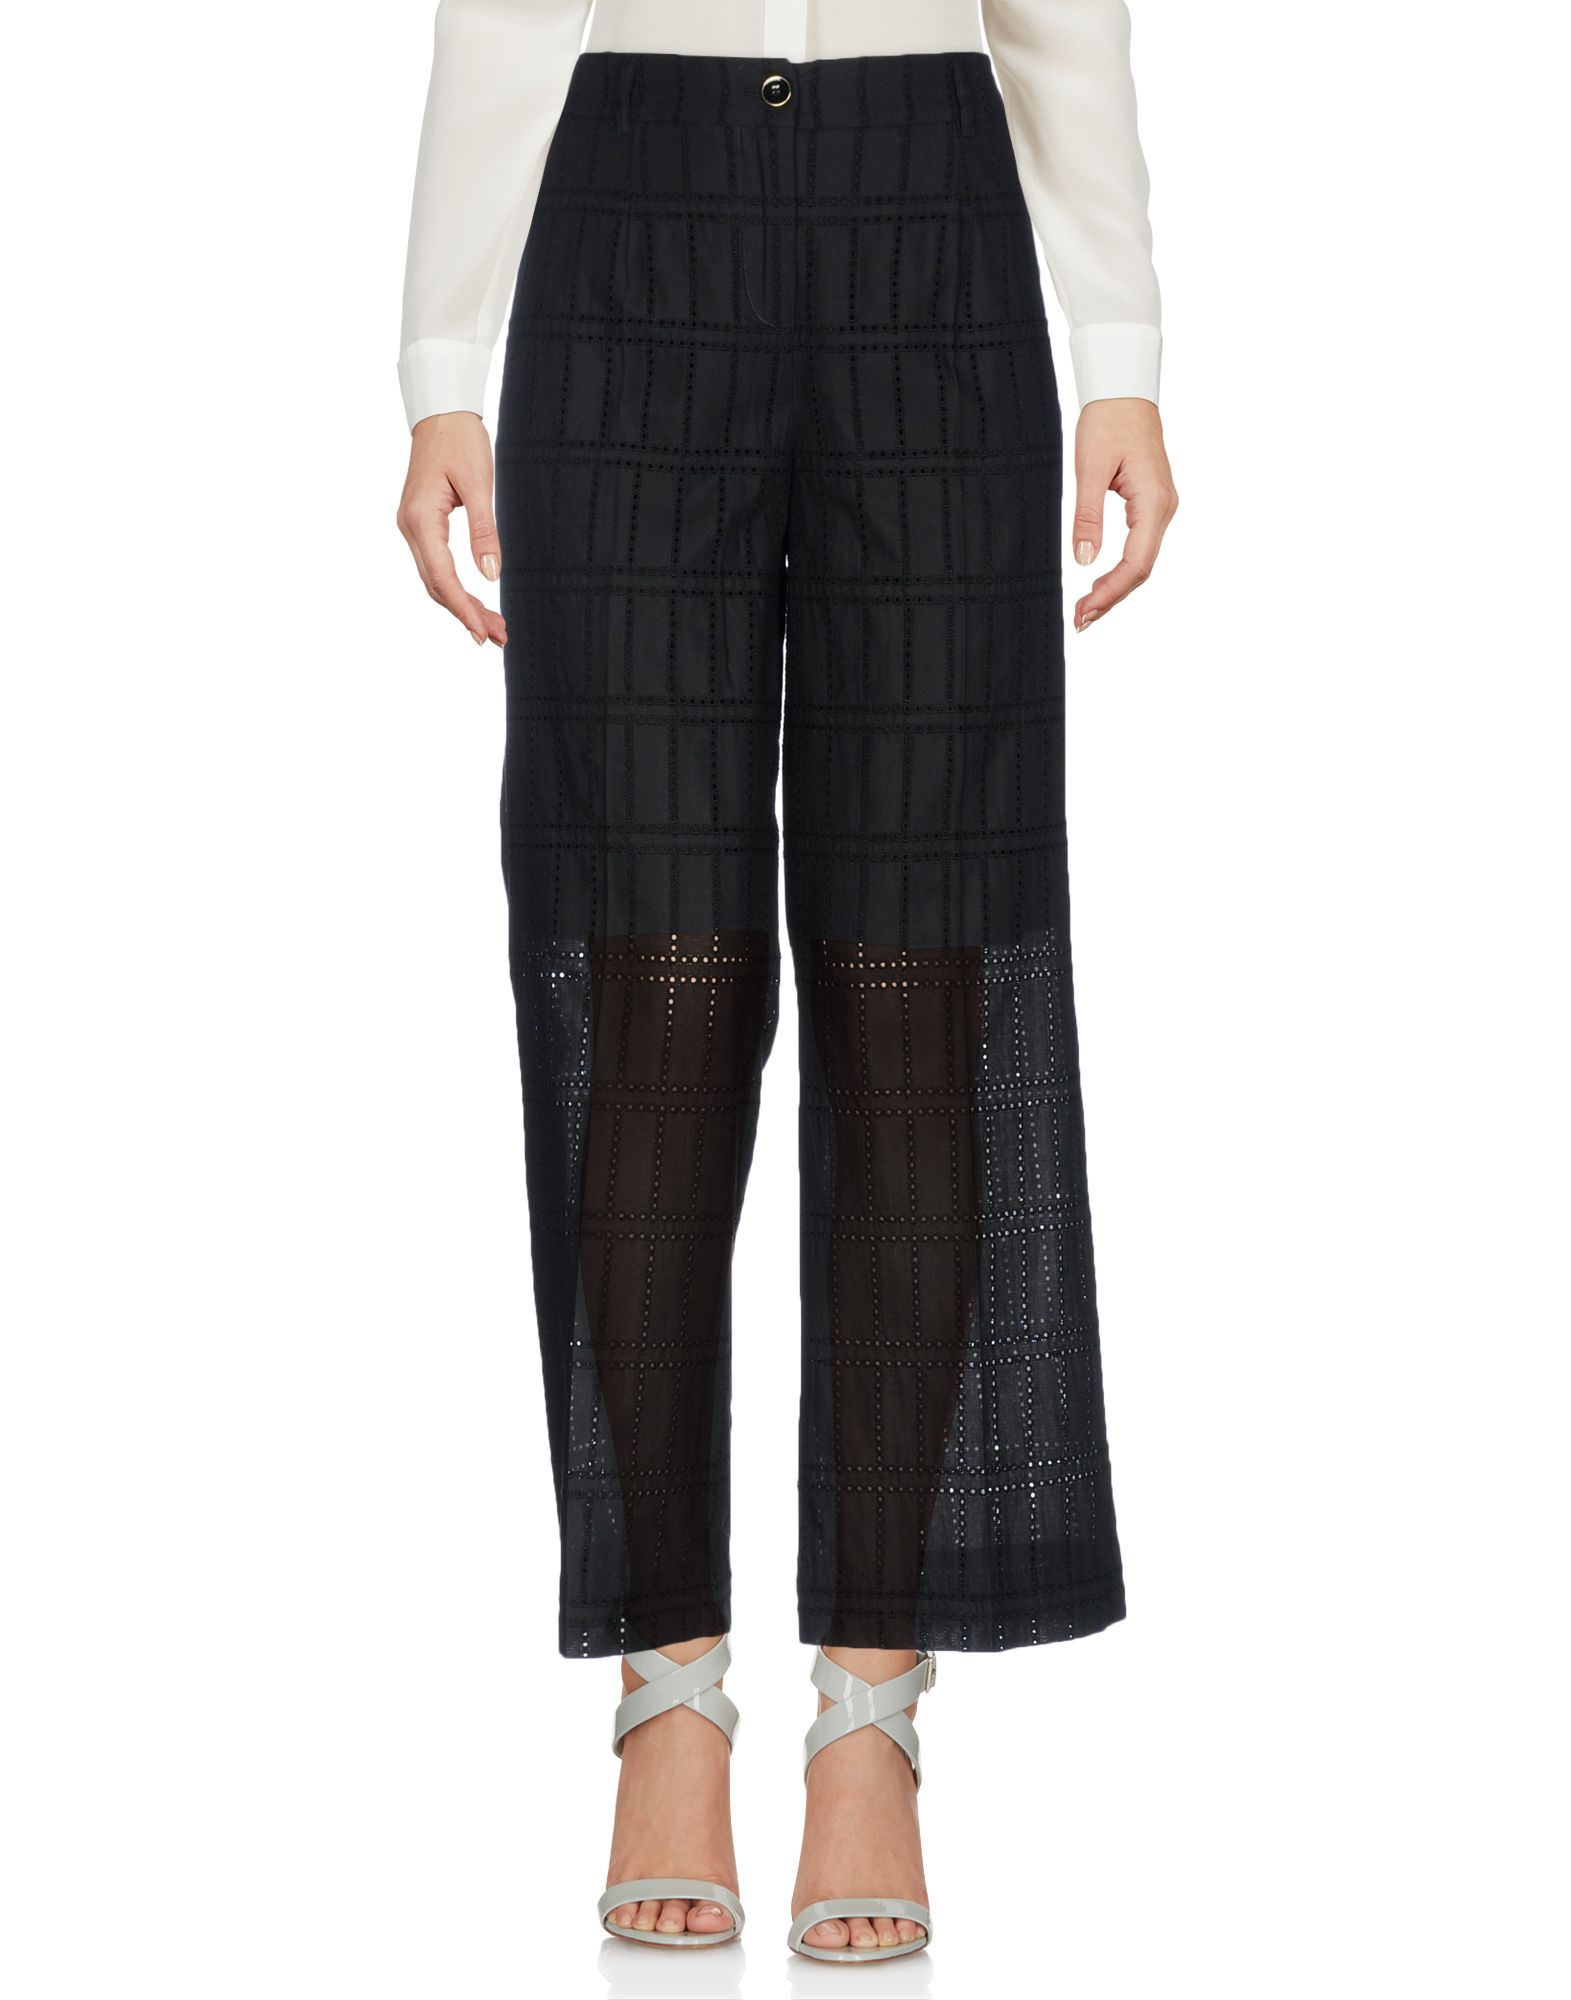 Pantalone Blumarine Donna - Acquista online su 3SqirSG